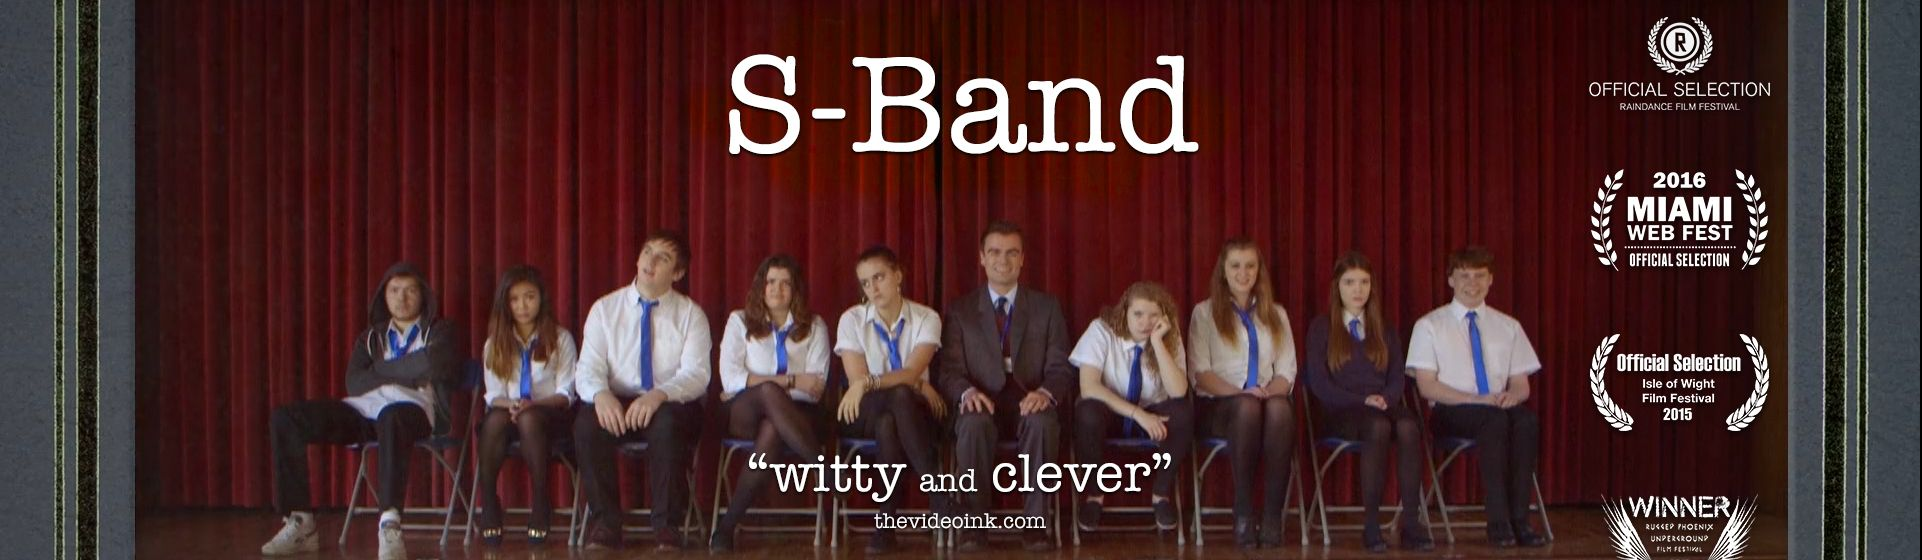 S-Band